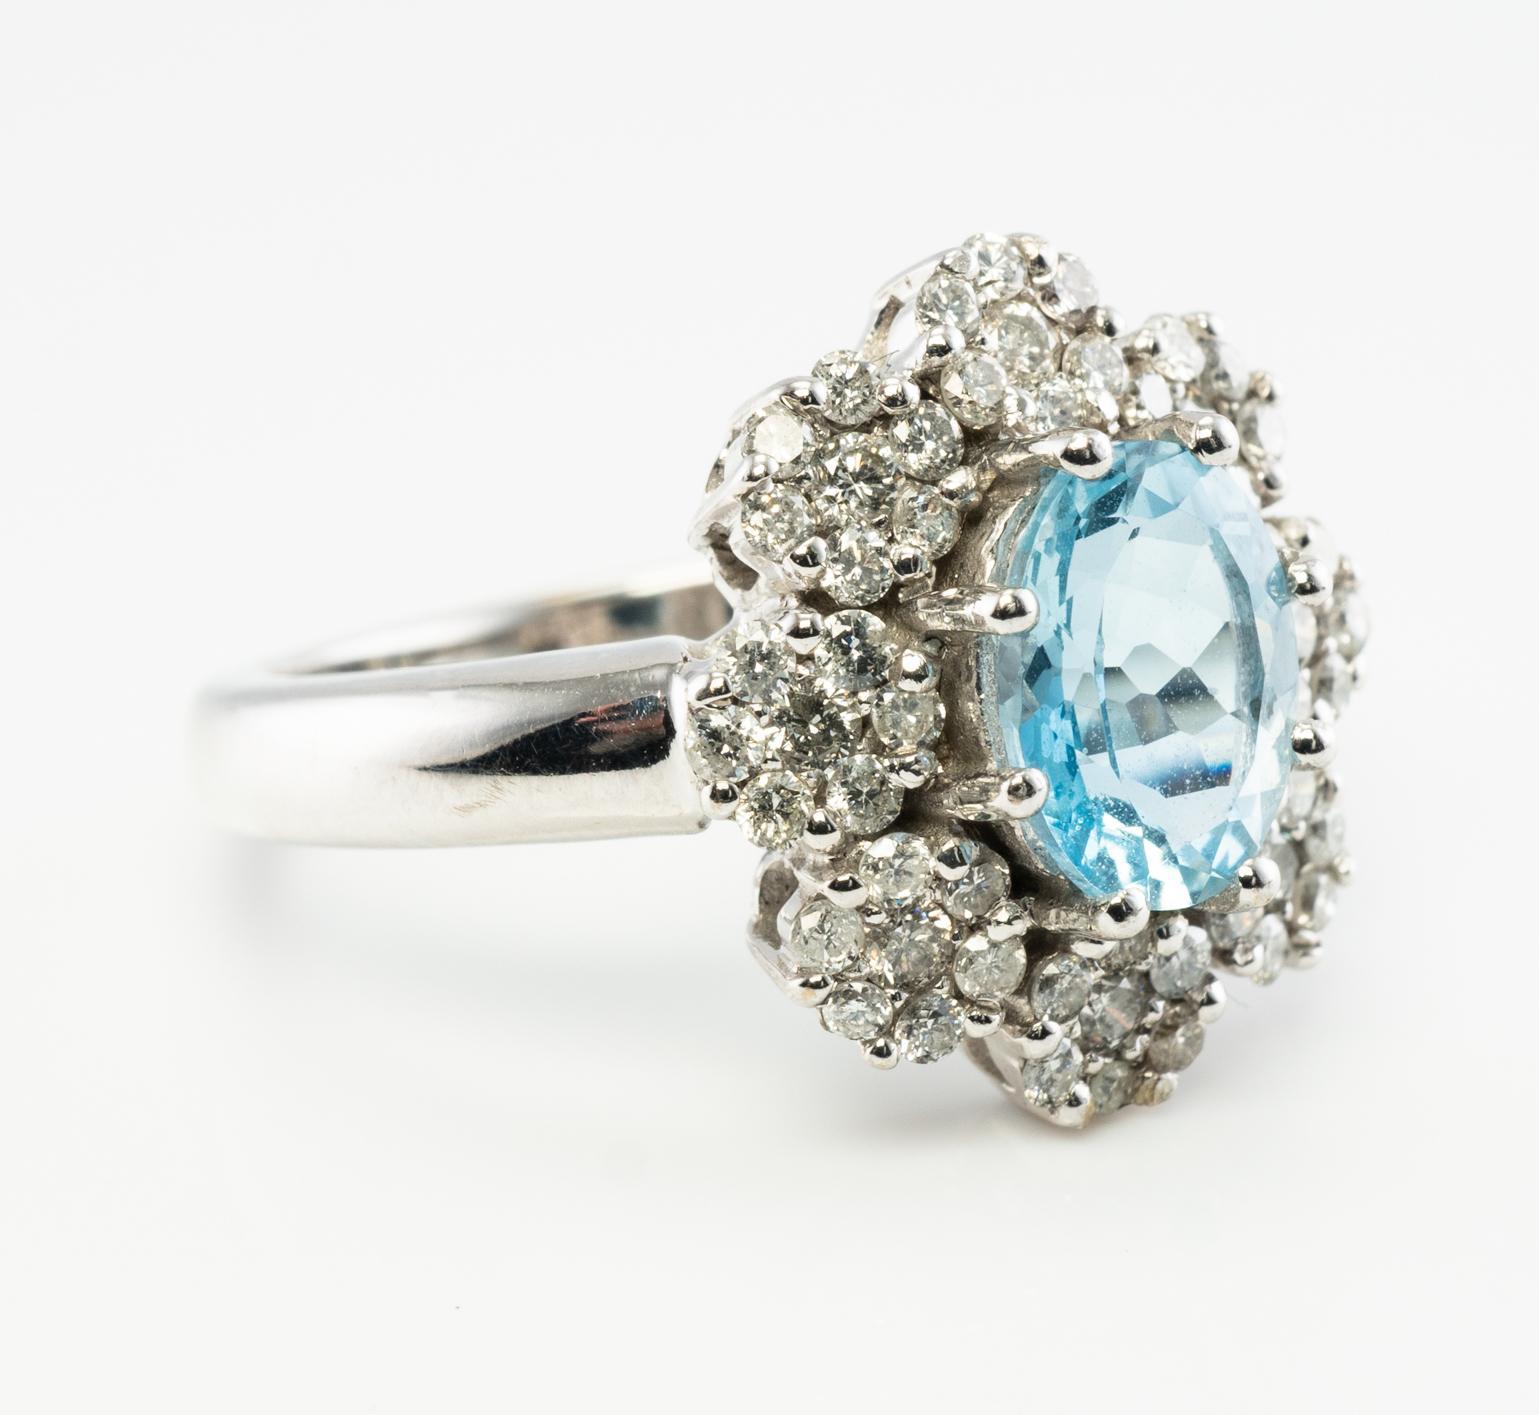 Estate Designer Signed Jewelry 14k White Gold Effy 1 1ct